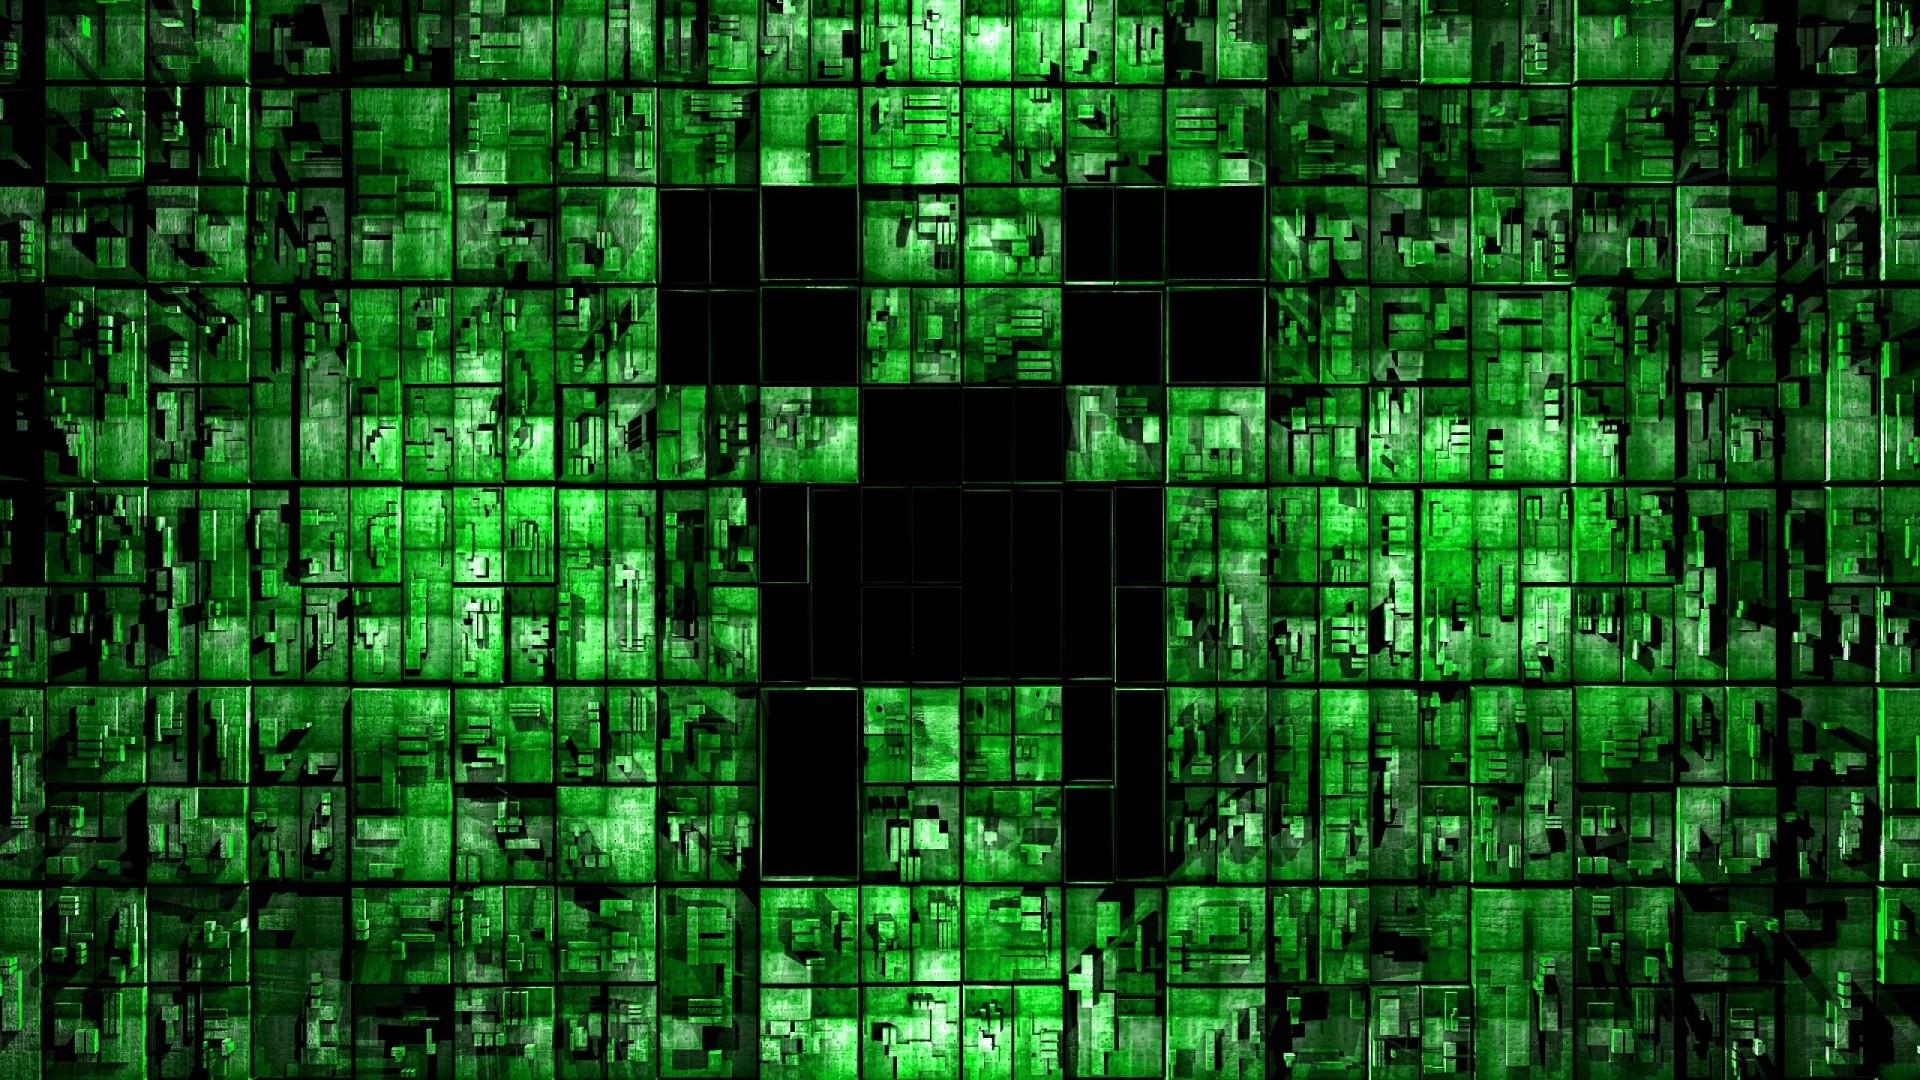 Best Wallpaper Minecraft Green - video-games-symmetry-Minecraft-green-creeper-pattern-texture-design-line-number-screenshot-font-1386  Graphic_142720.jpg